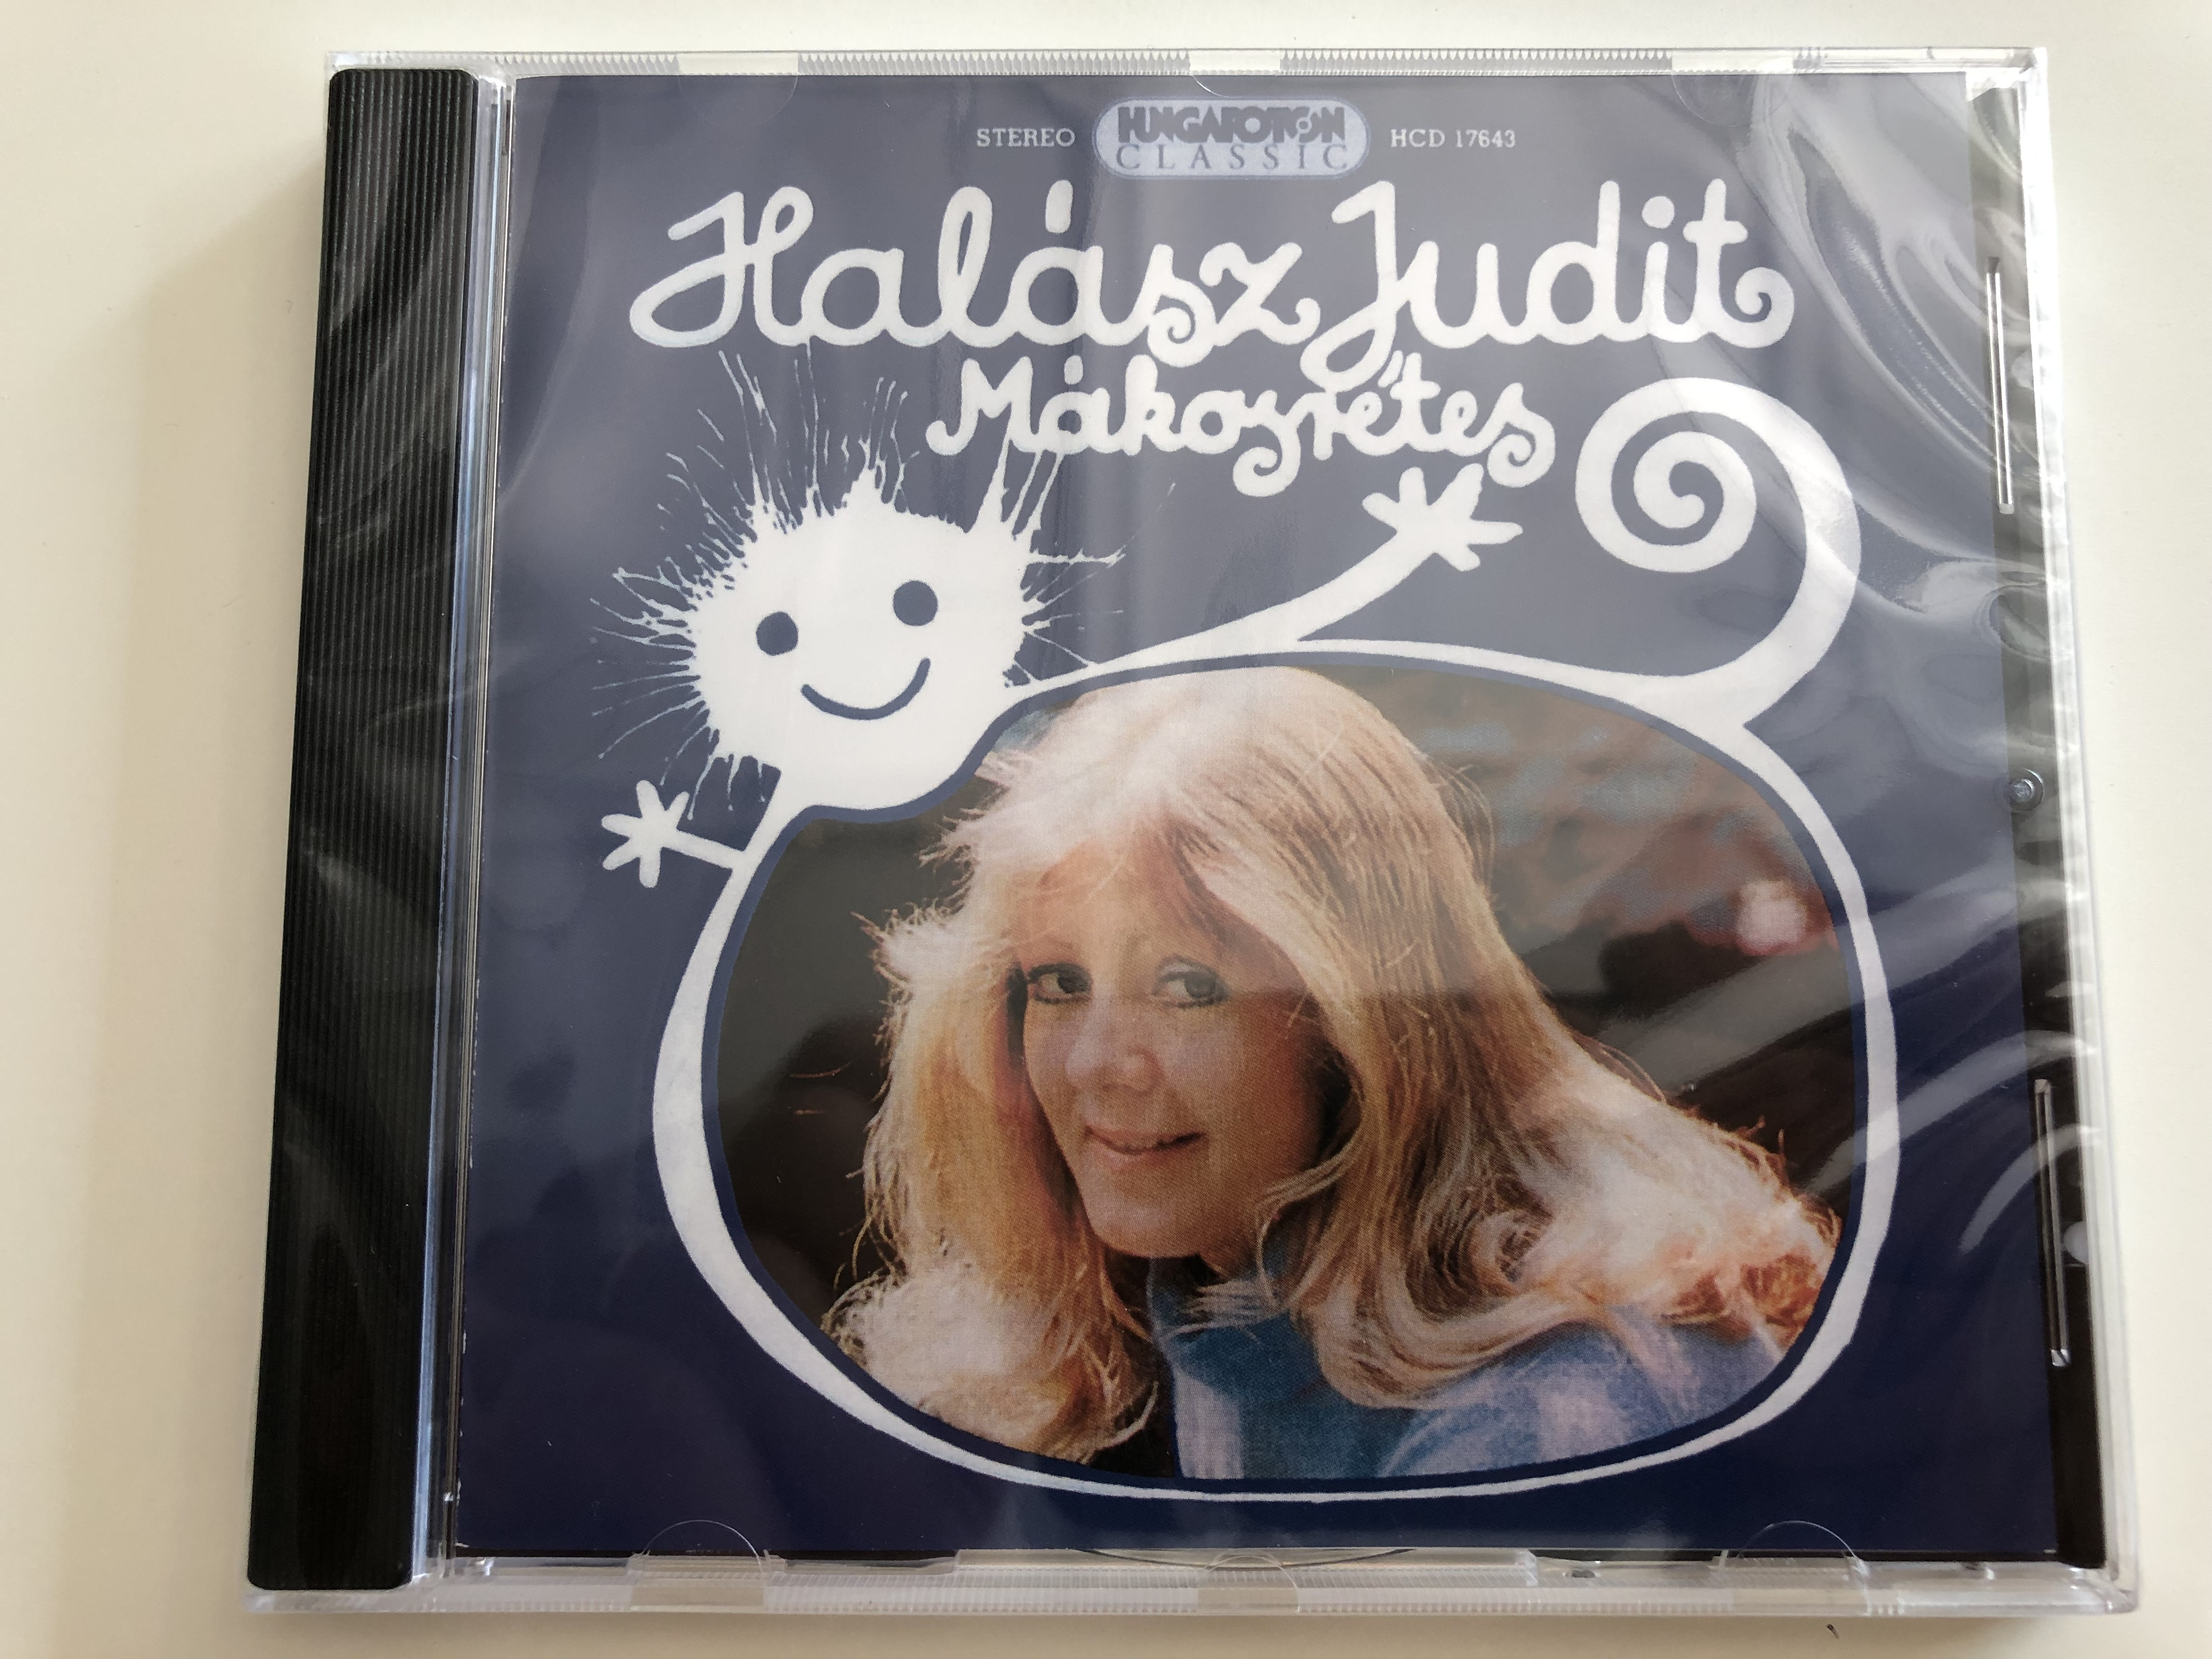 hal-sz-judit-m-kosr-tes-ft.-fonogr-f-bojtorj-n-audio-cd-1998-hungaroton-classic-hcd-17643-1-.jpg